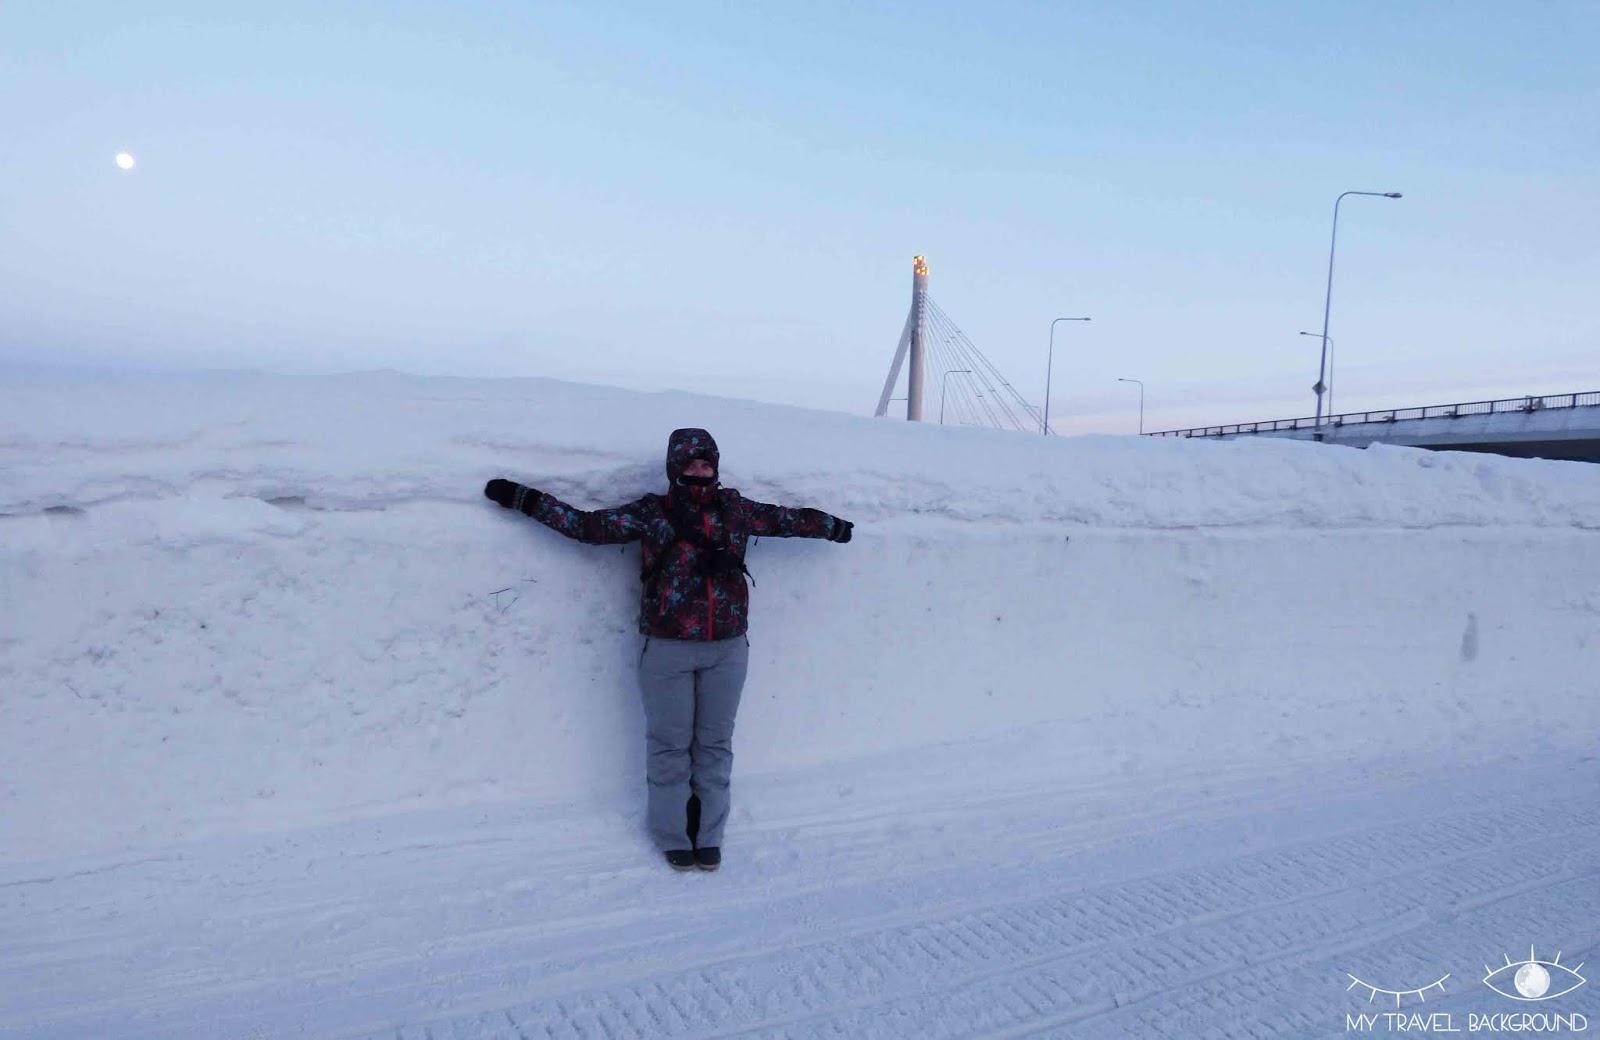 My Travel Background : road trip de 10 jours autour de la mer baltique : Danemark, Finlande, Estonie - Rovaniemi